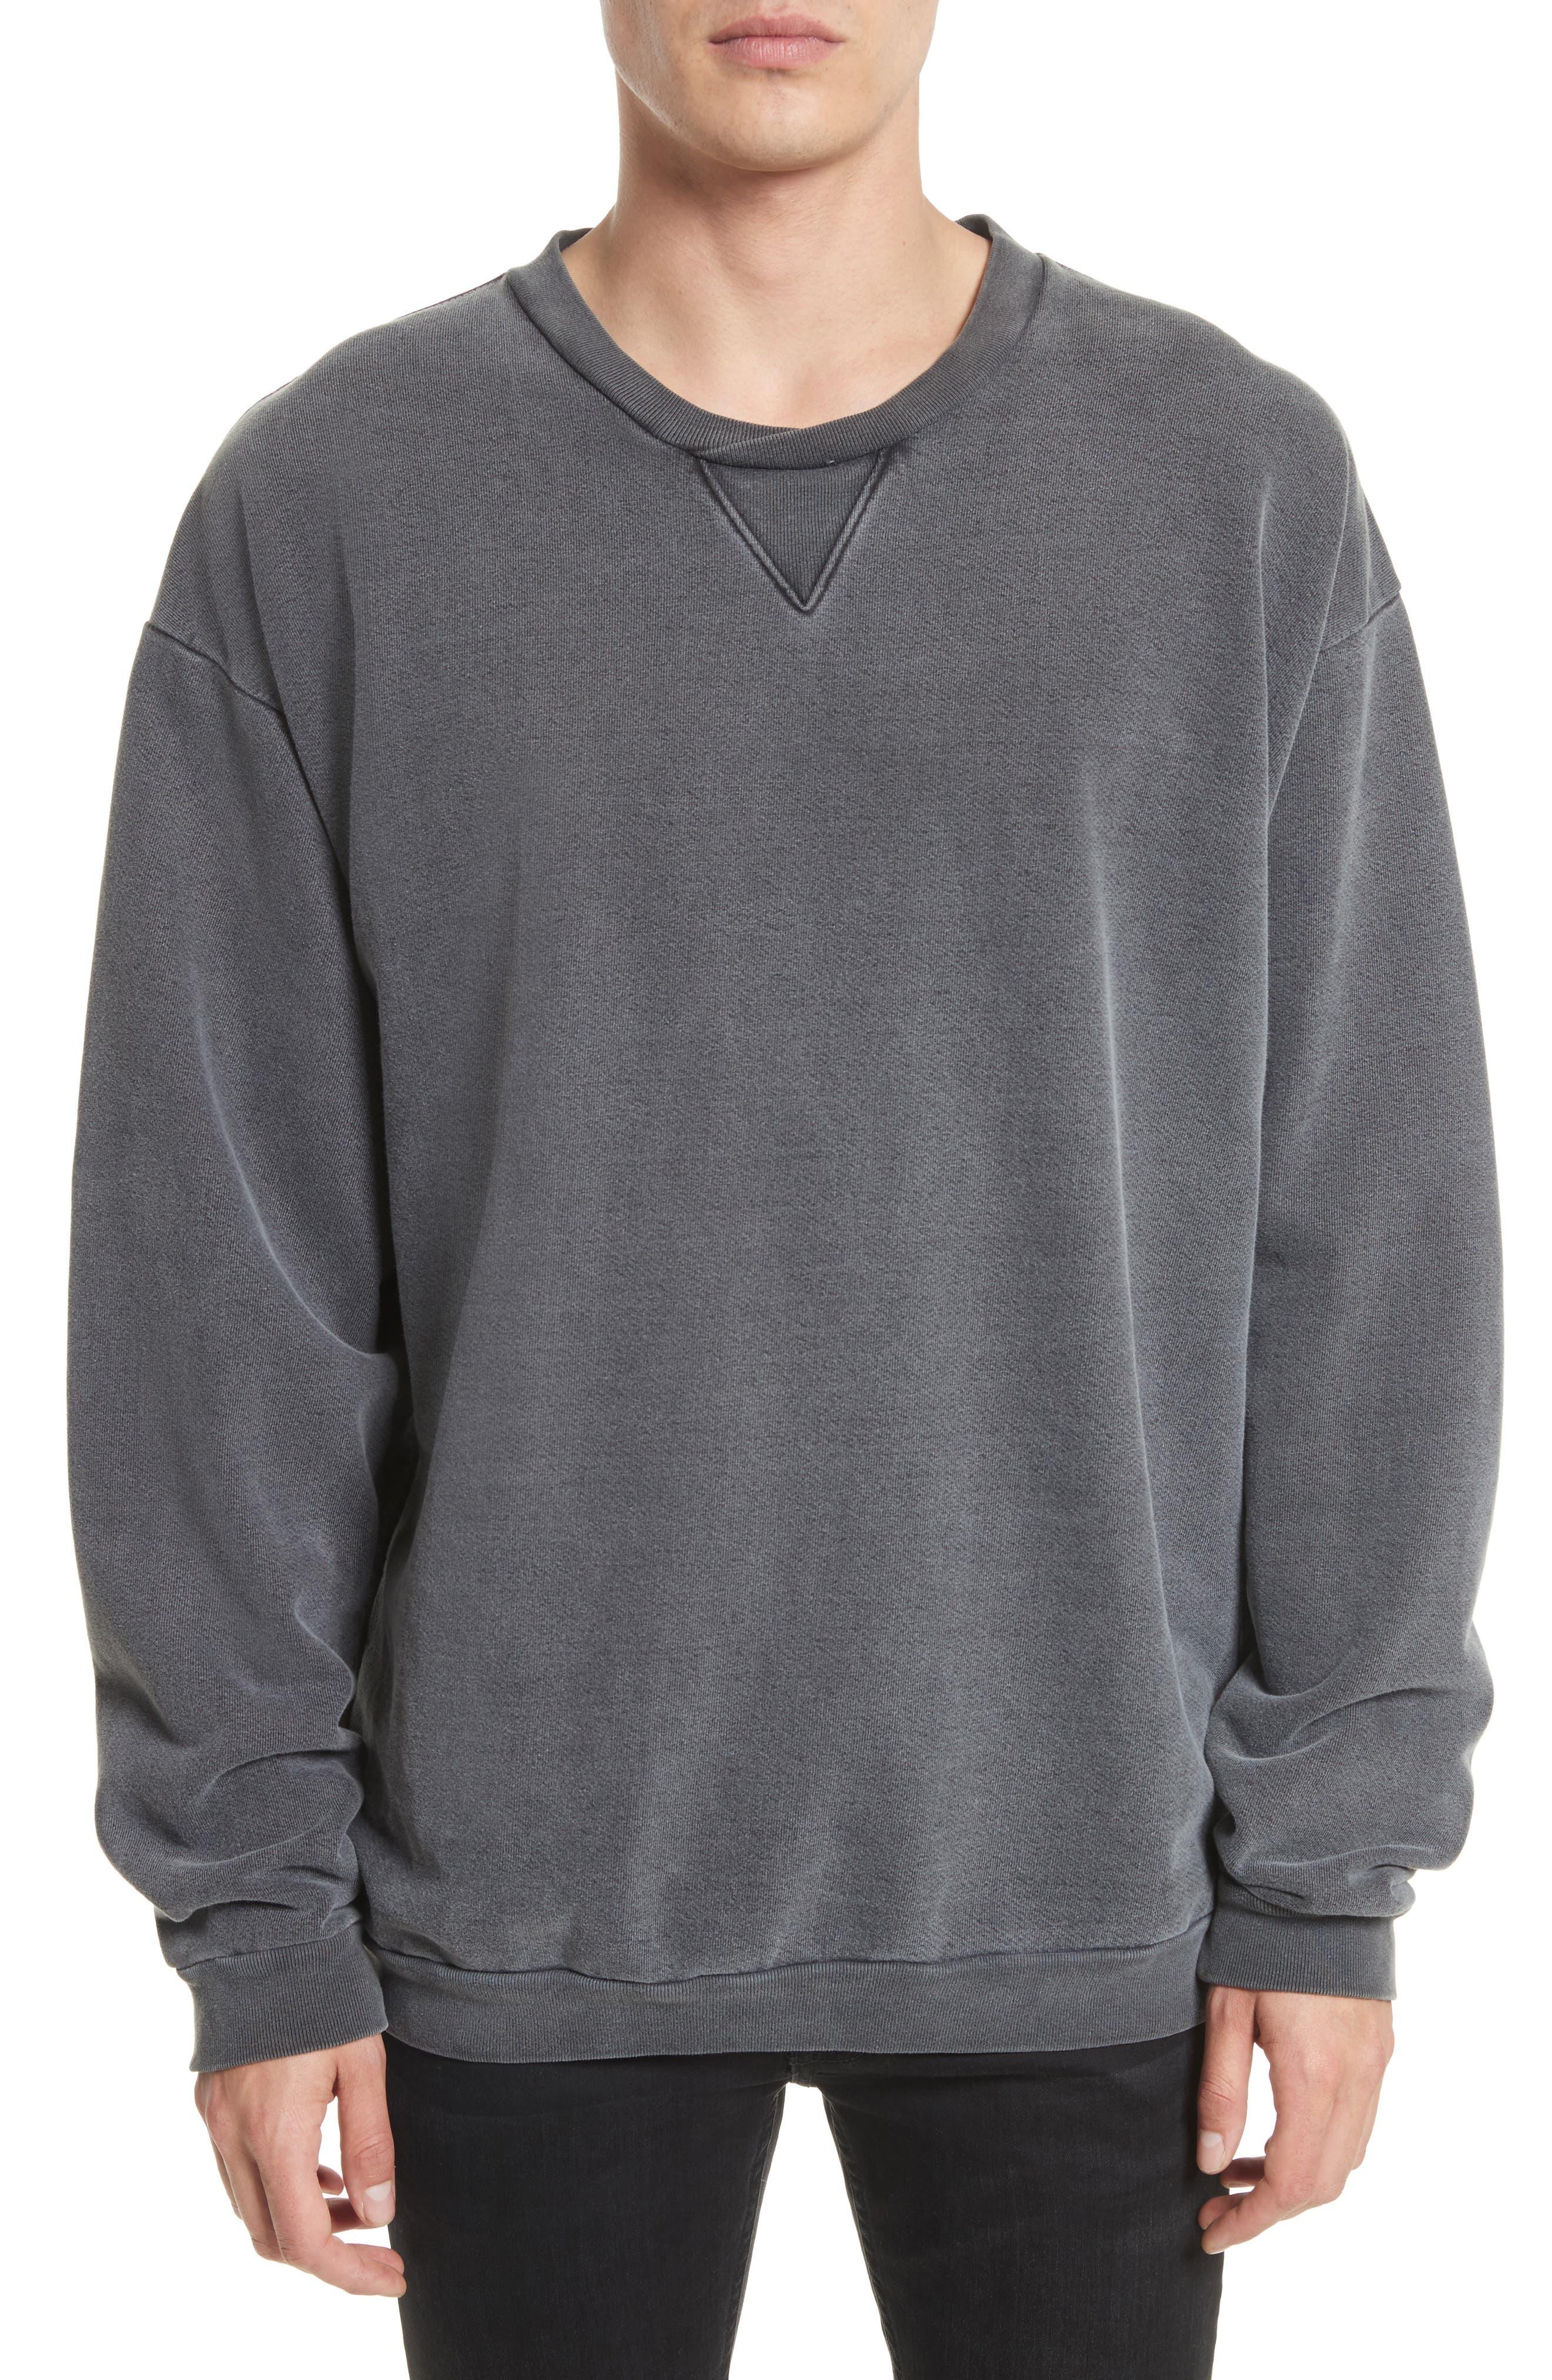 Norton Sweatshirt,                             Main thumbnail 1, color,                             001